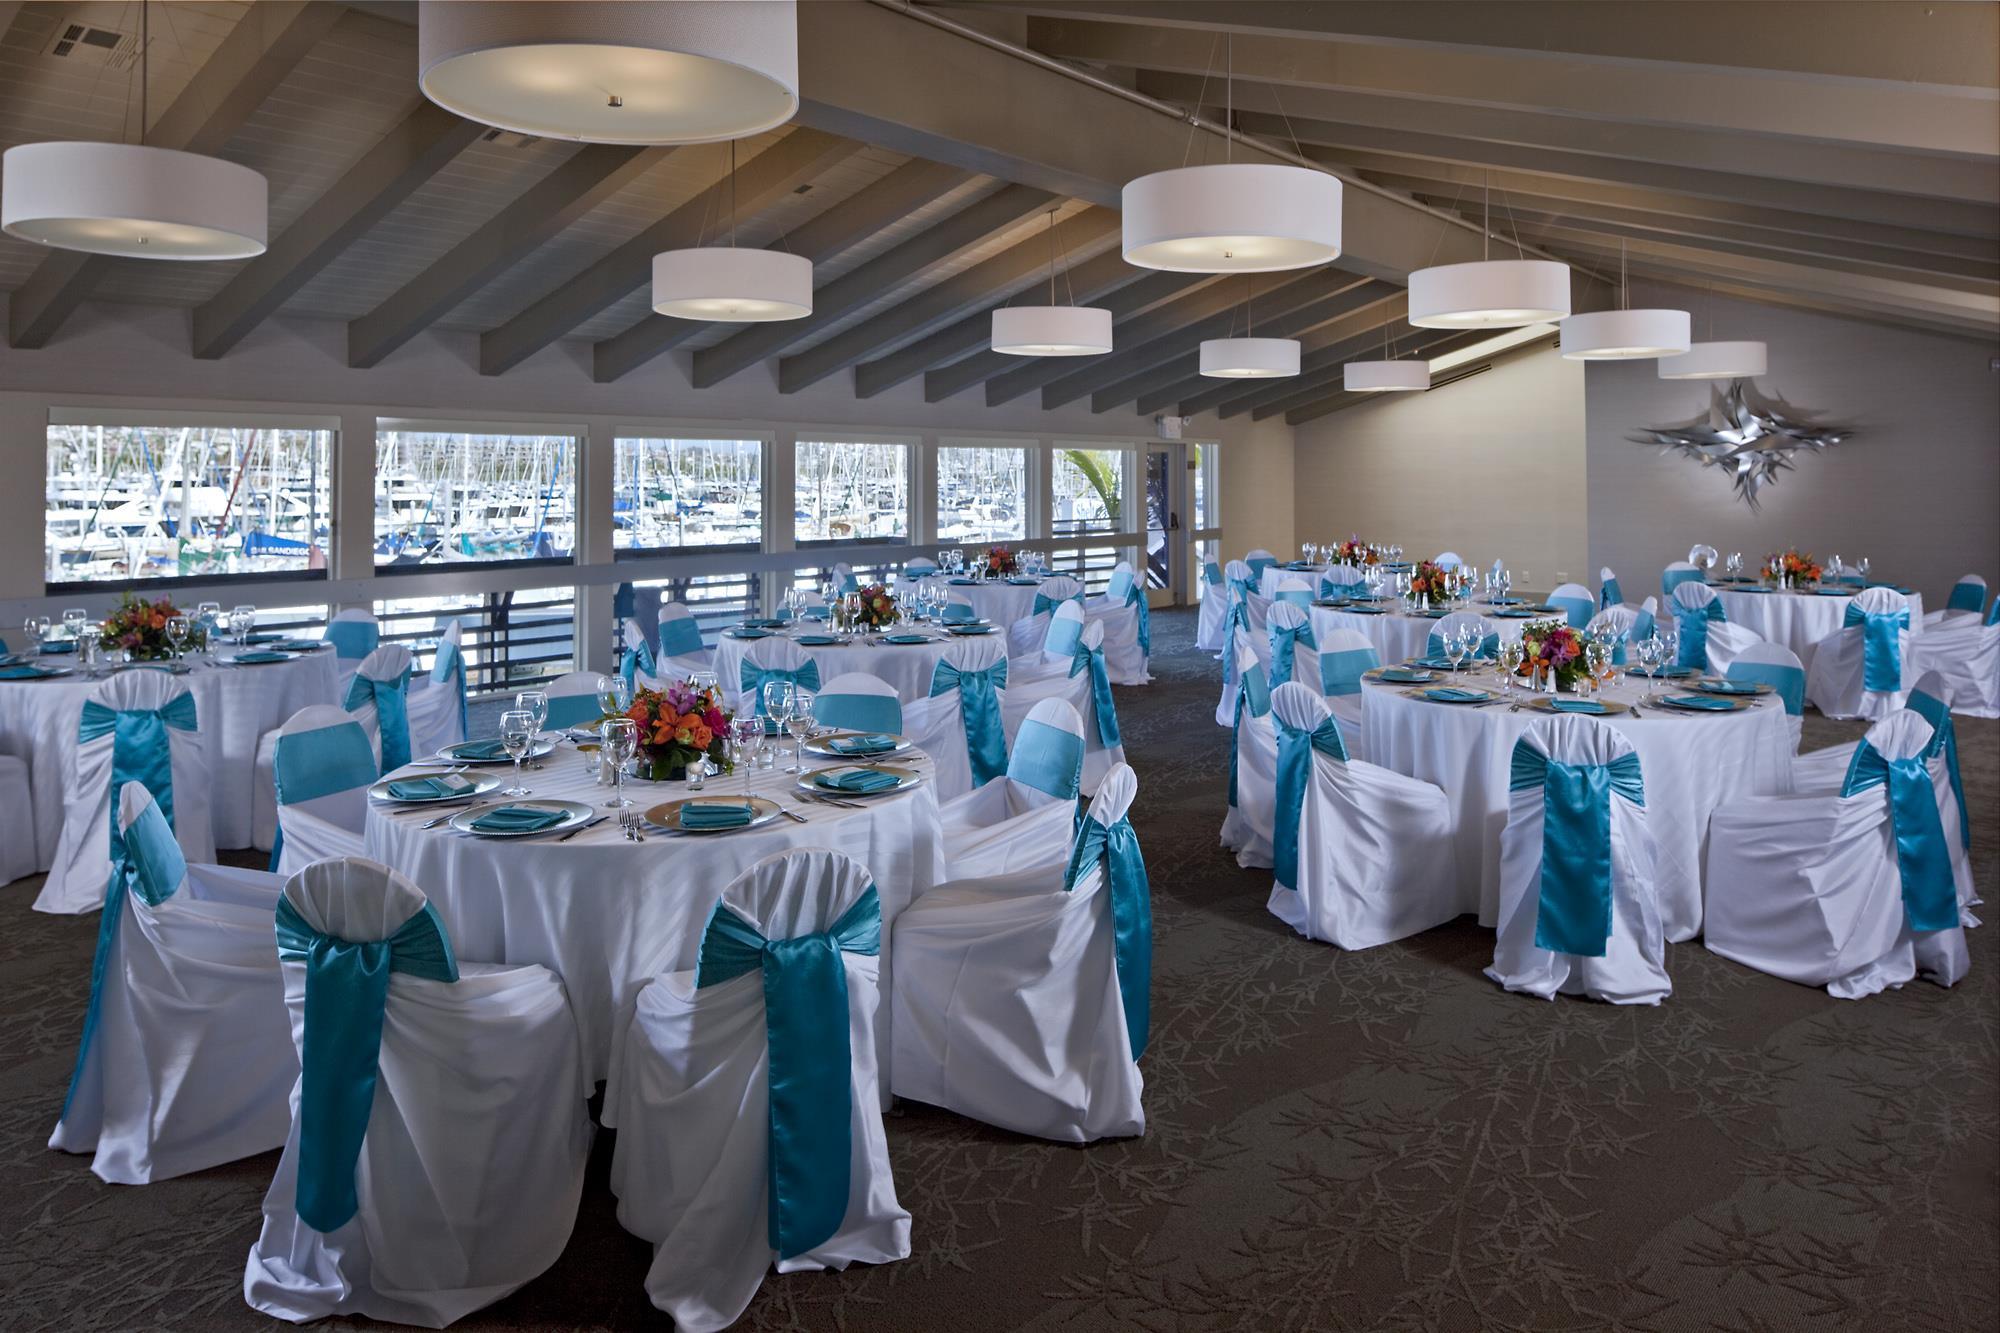 Best Western Plus Island Palms Hotel & Marina image 24